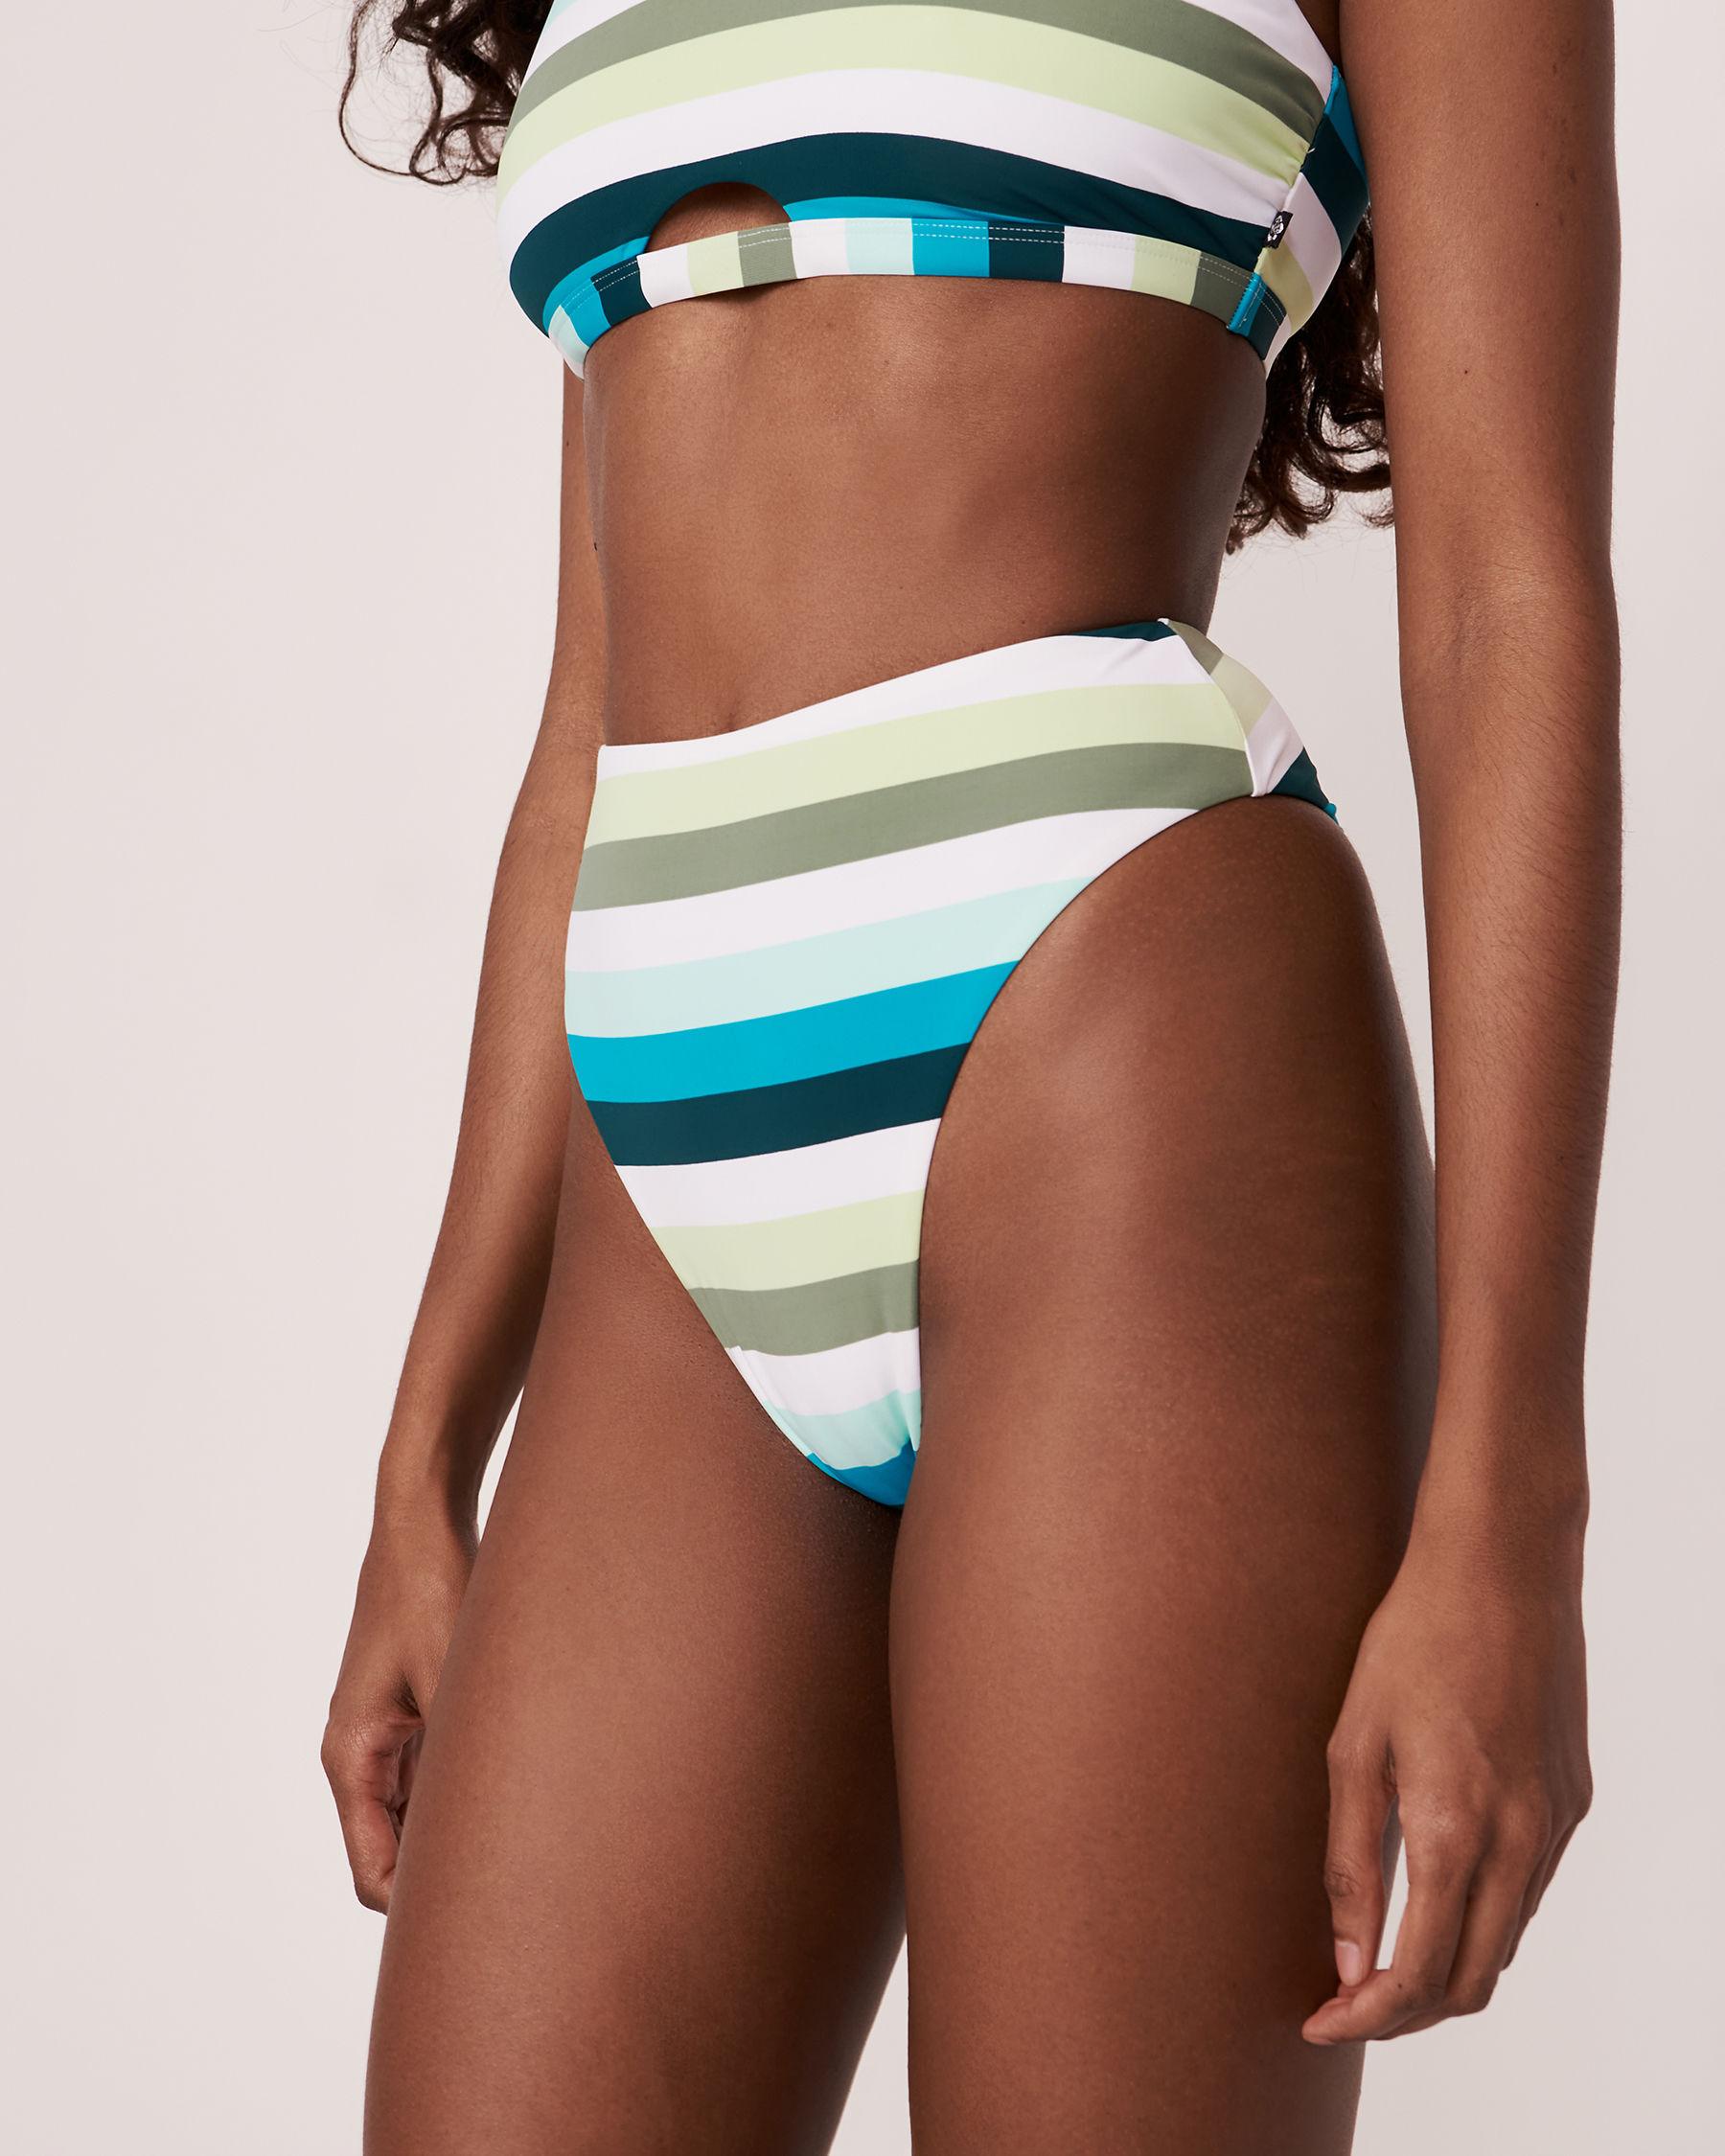 LA VIE EN ROSE AQUA Bas de bikini tanga taille haute LAGOON Tons de bleu 70300092 - Voir1